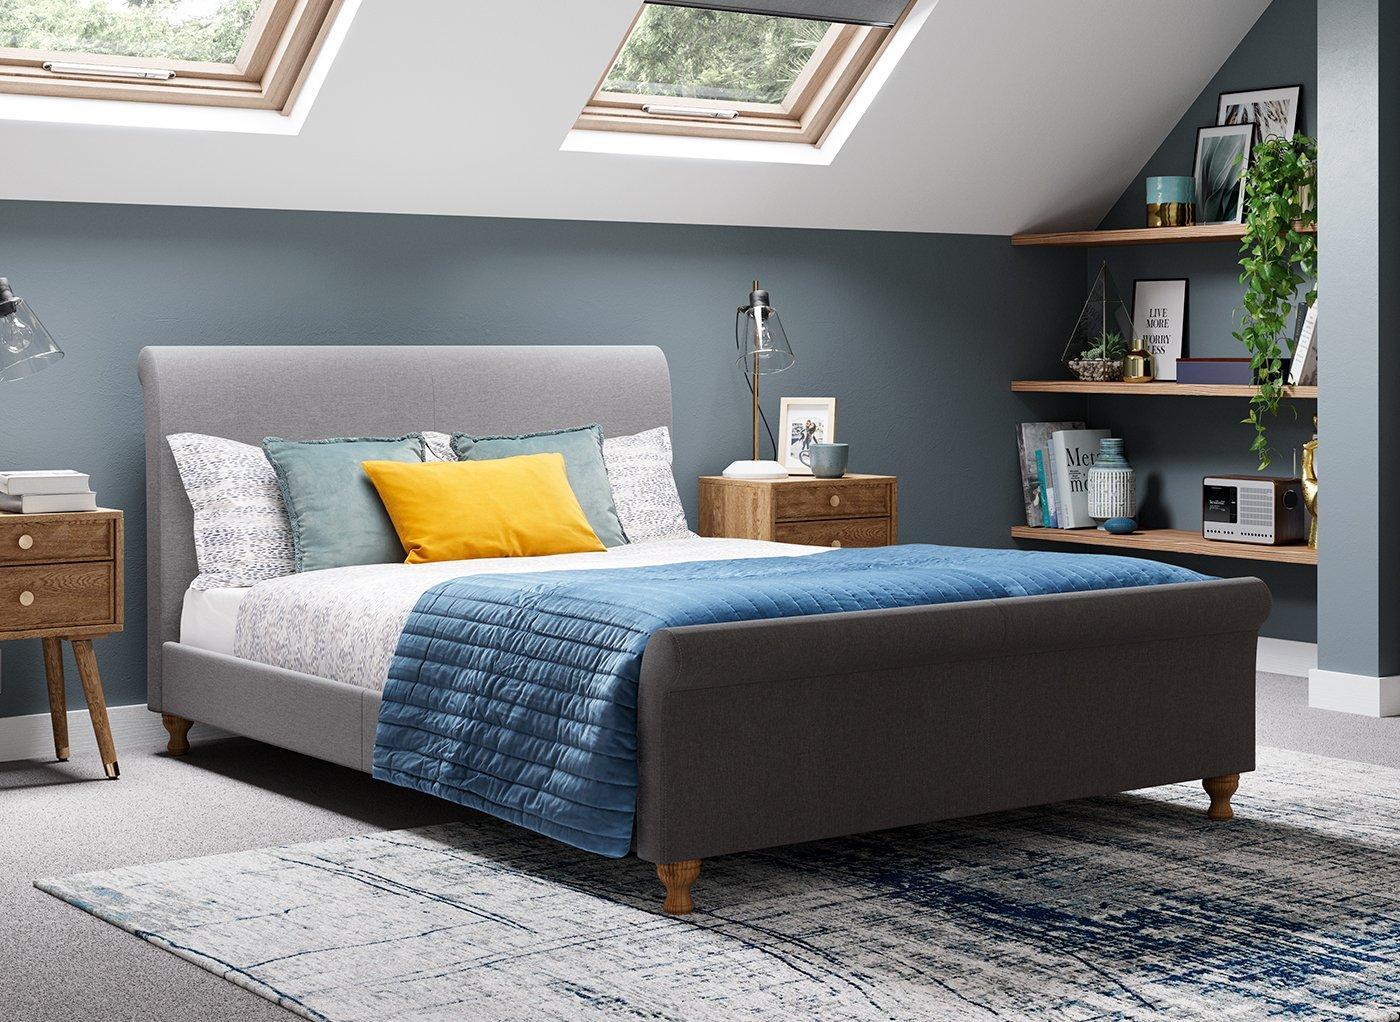 marley-upholstered-low-rise-bed-frame